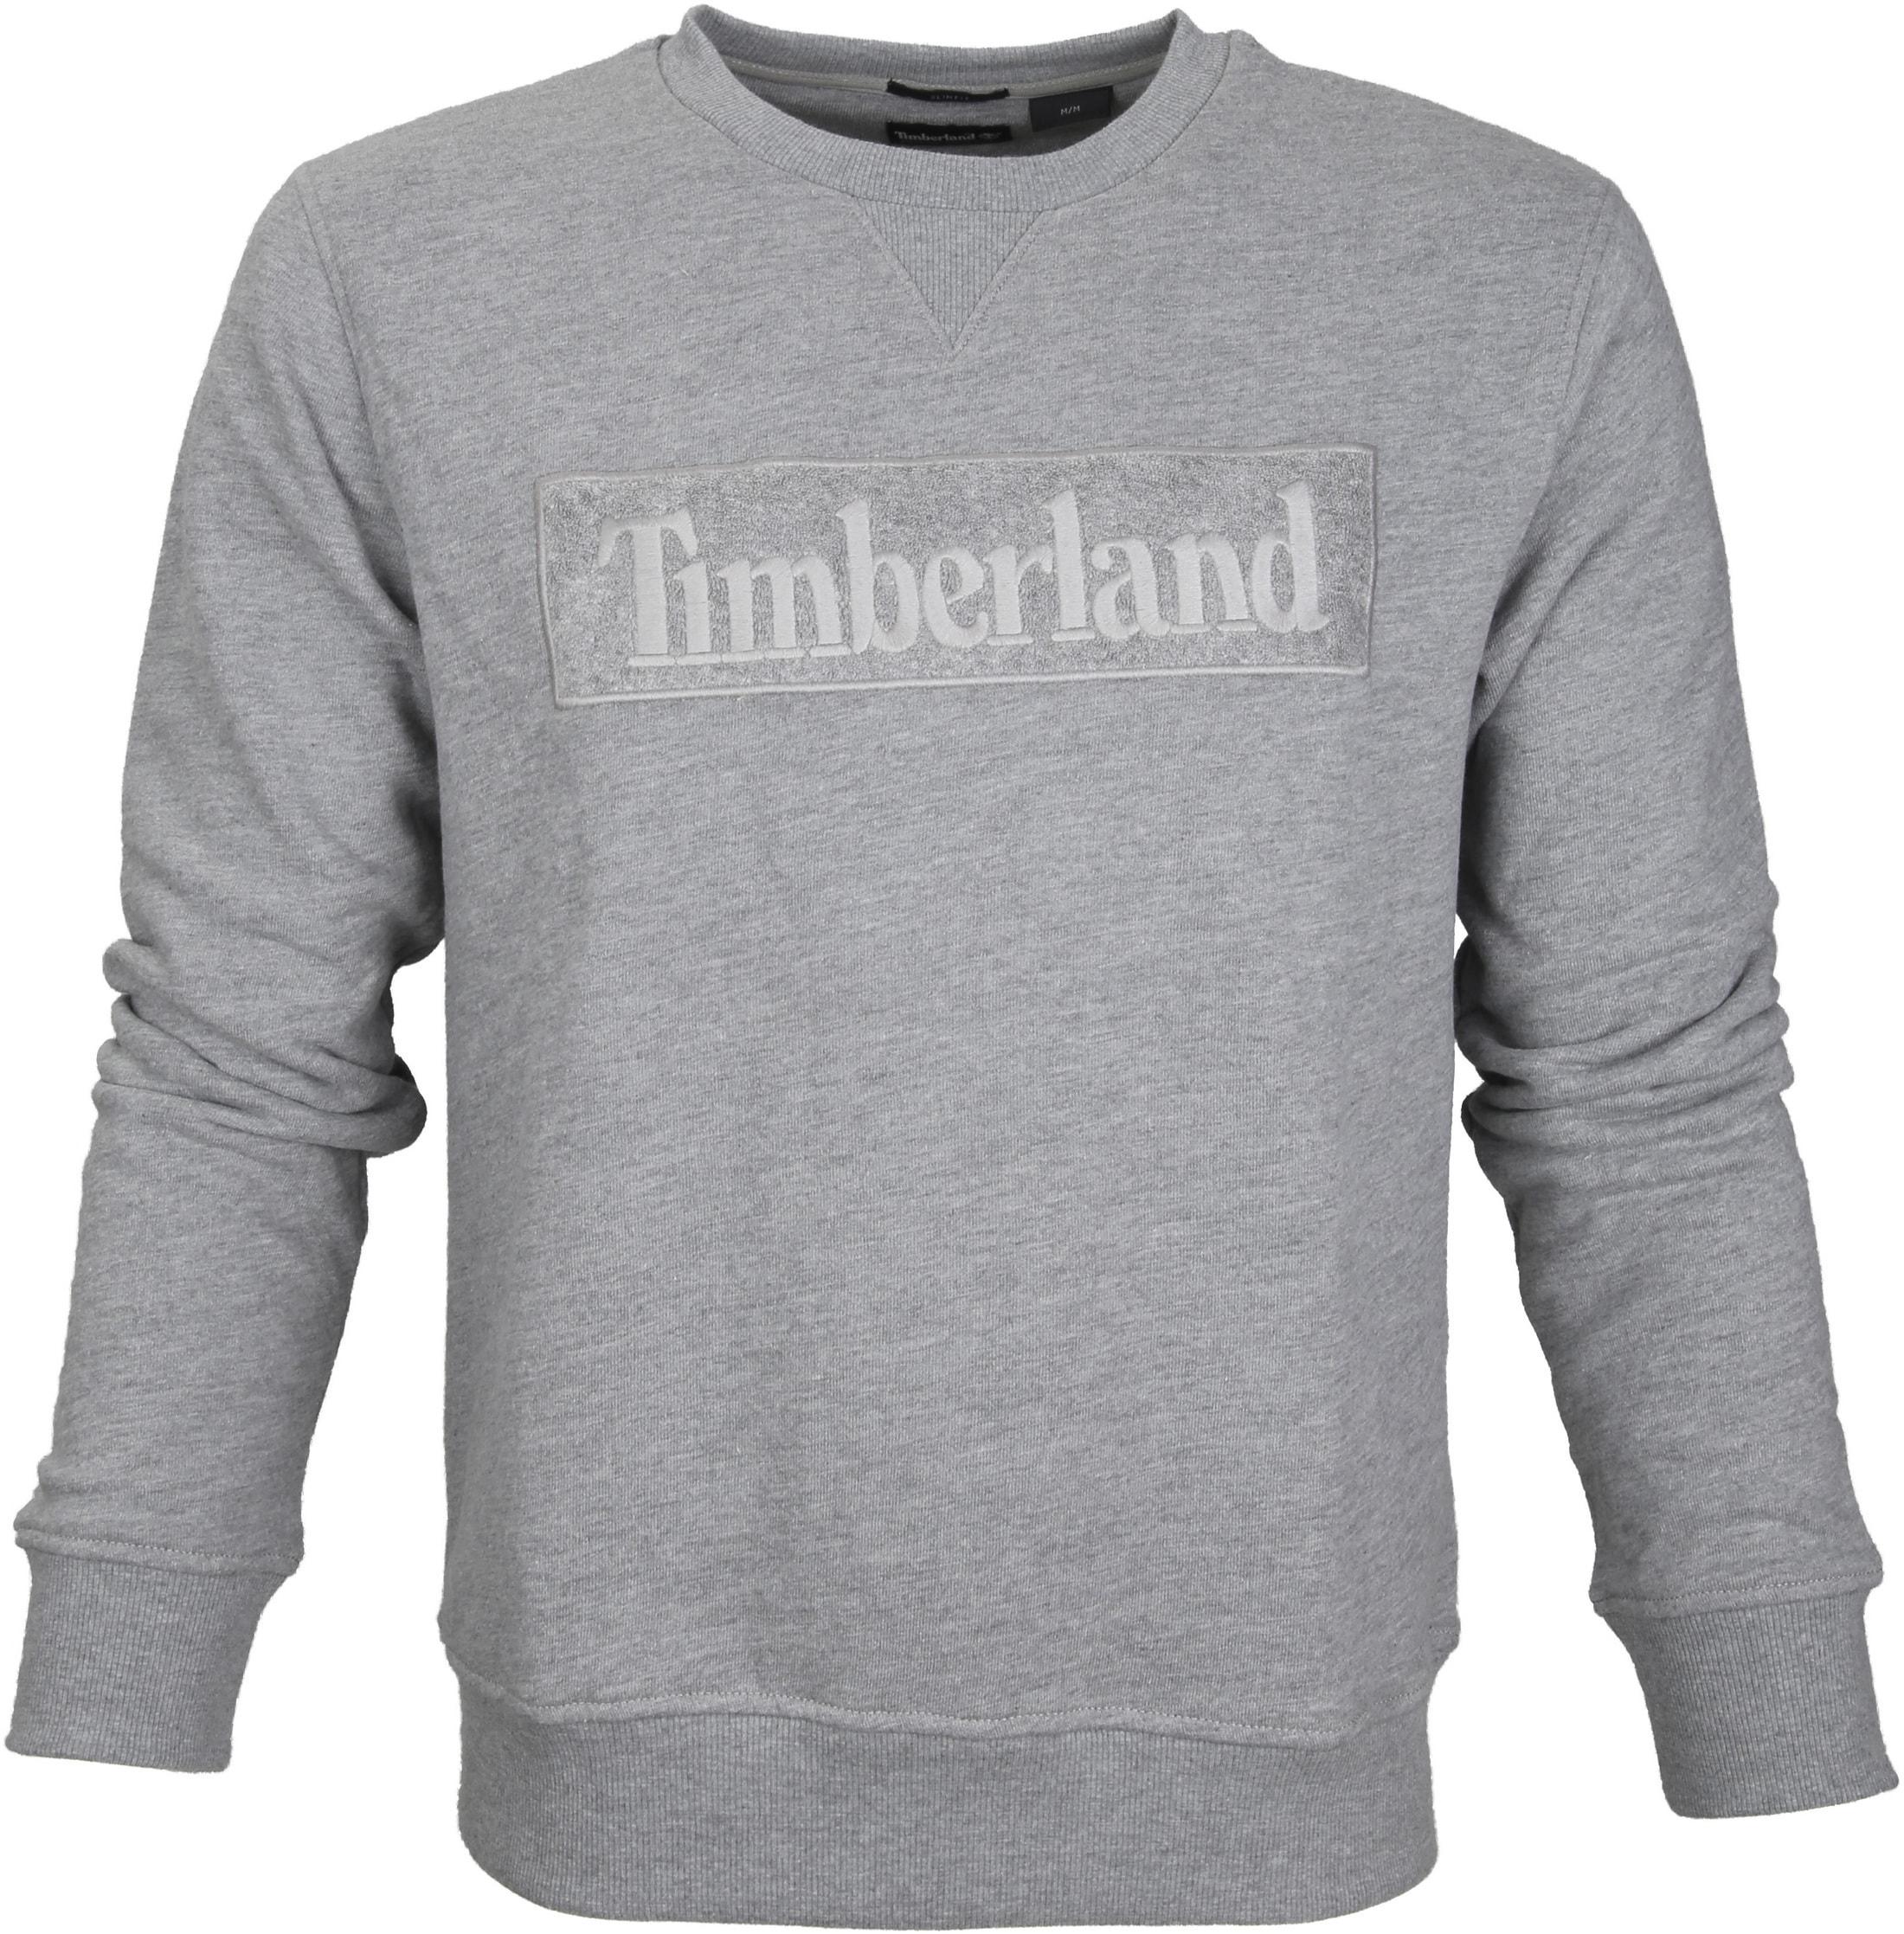 Timberland Sweater Grau Logo foto 0